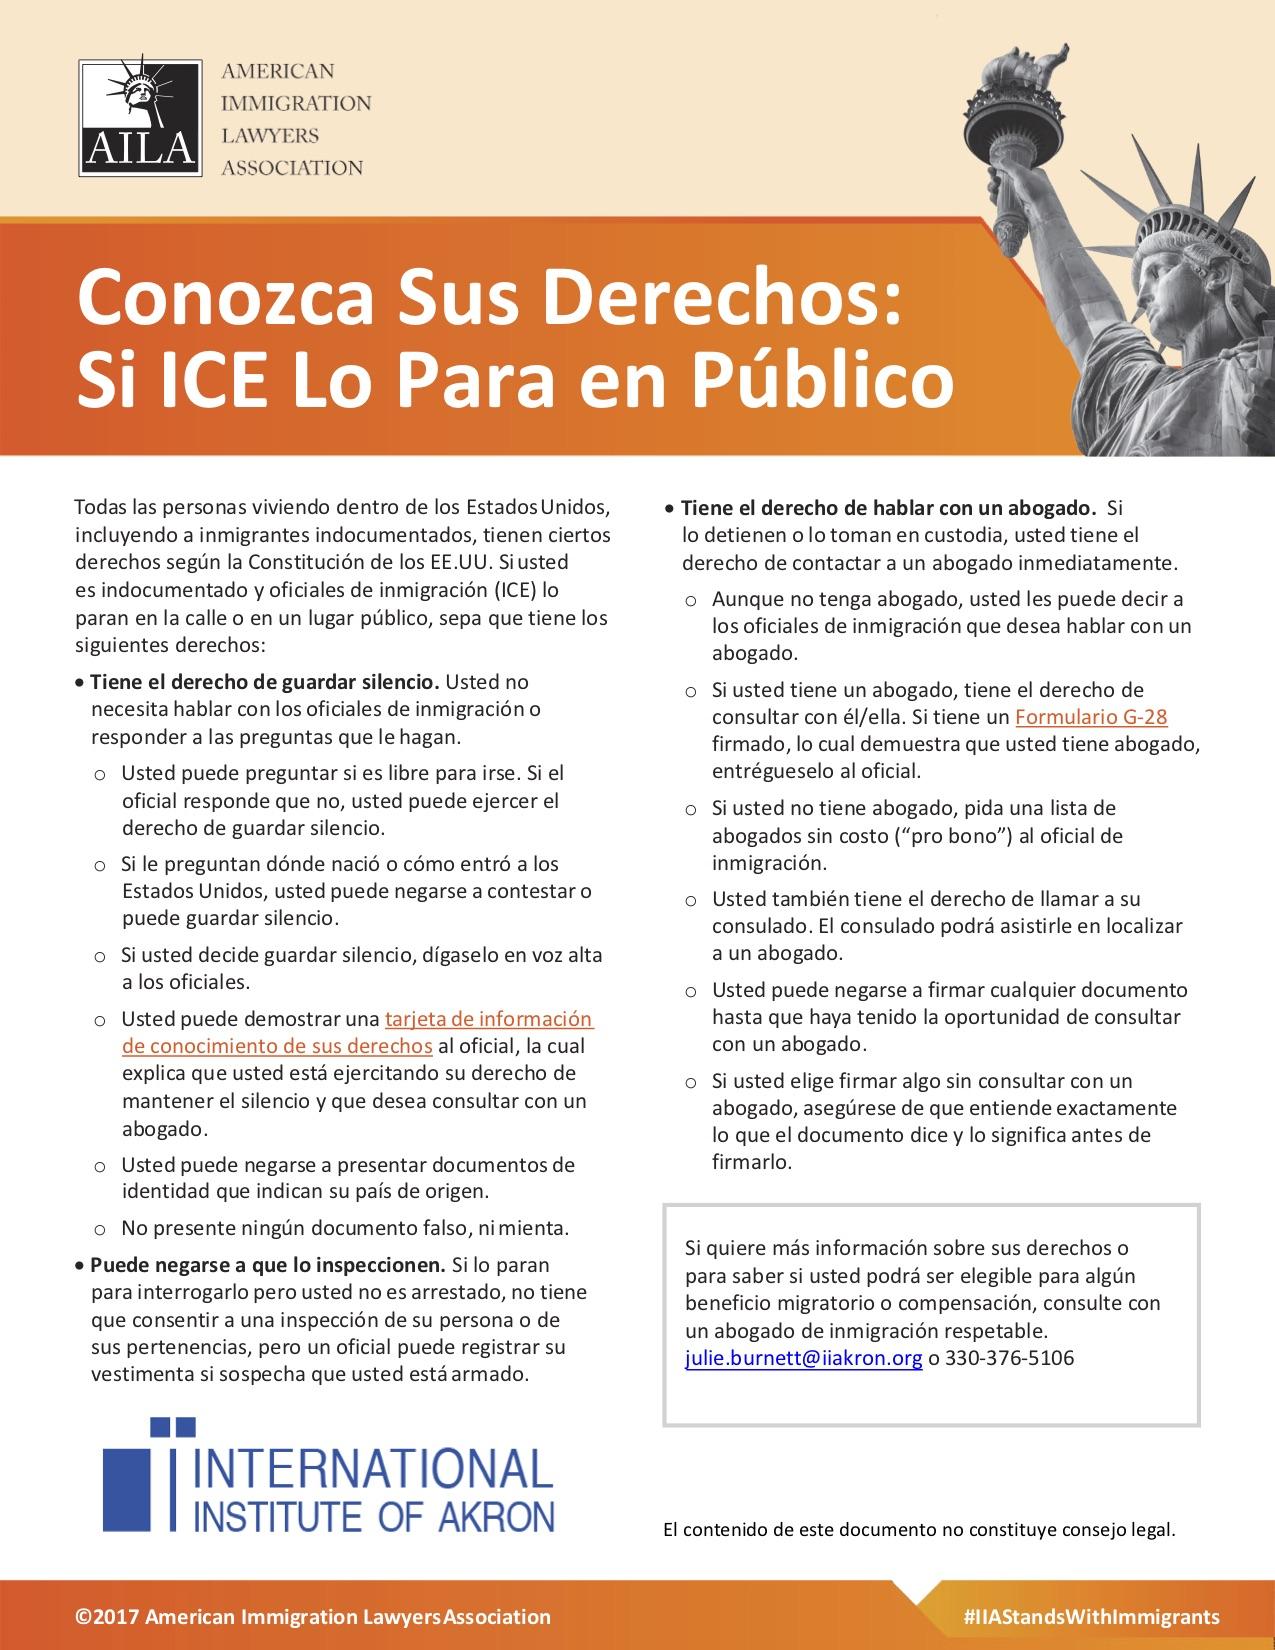 spanish public.jpg